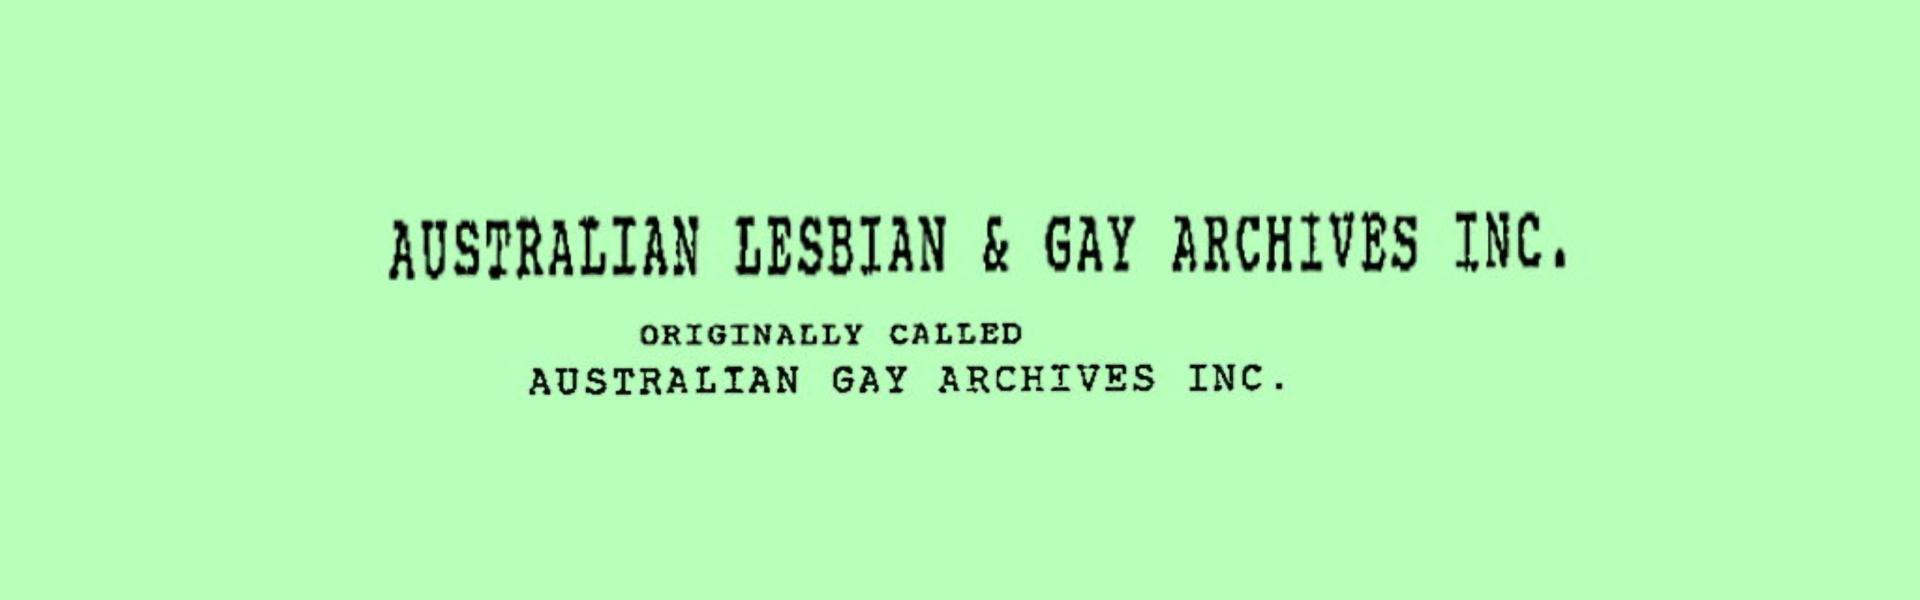 Certificate of incorporation, 1991, Records of ALGA – Banner Web